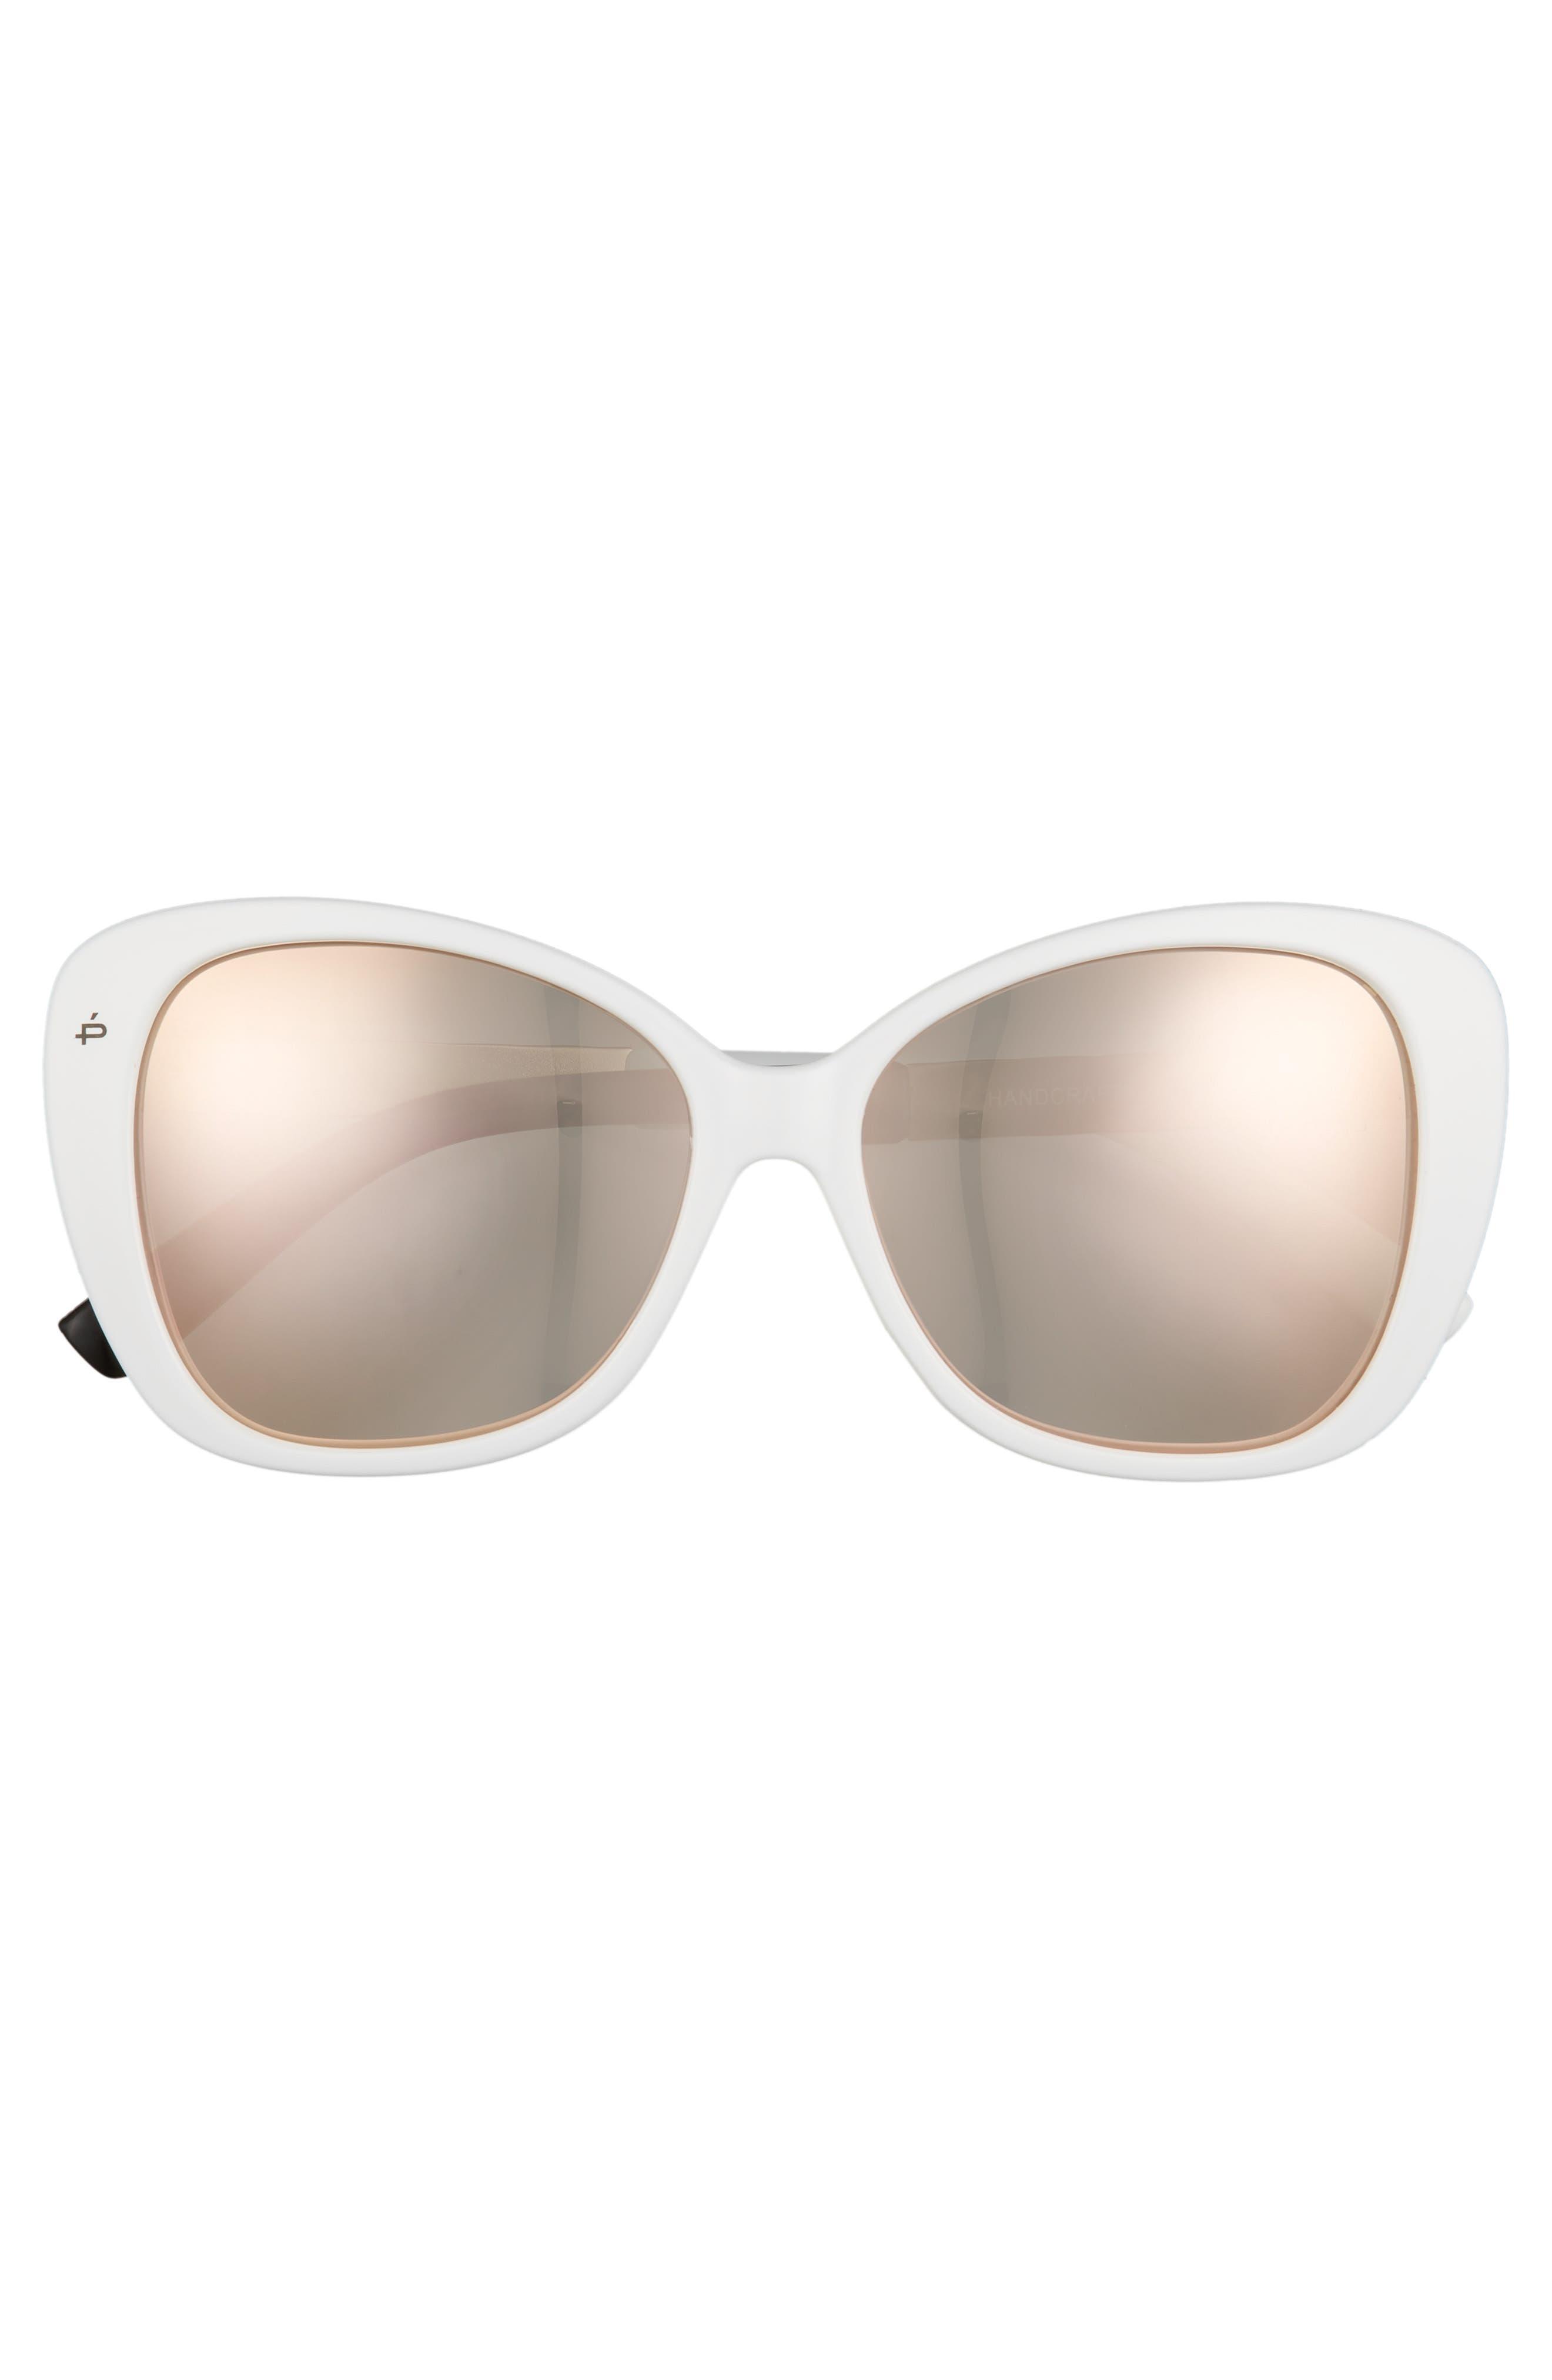 Privé Revaux The Jackie O 56mm Cat Eye Sunglasses,                             Alternate thumbnail 3, color,                             White Polarized